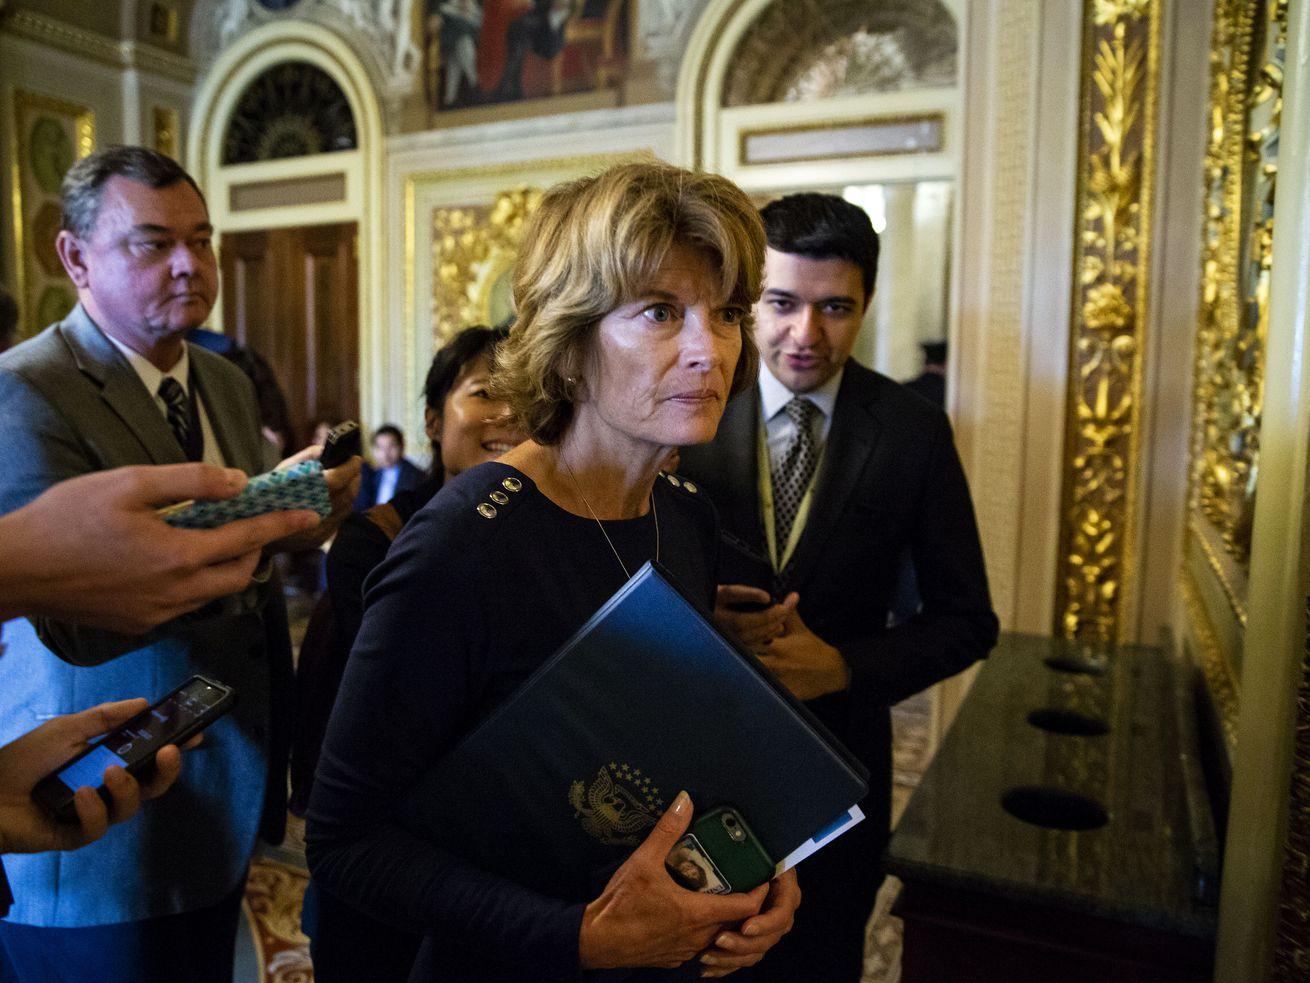 Sen. Lisa Murkowski (R-AK)emphasizes listening to Kavanaugh's accusers.